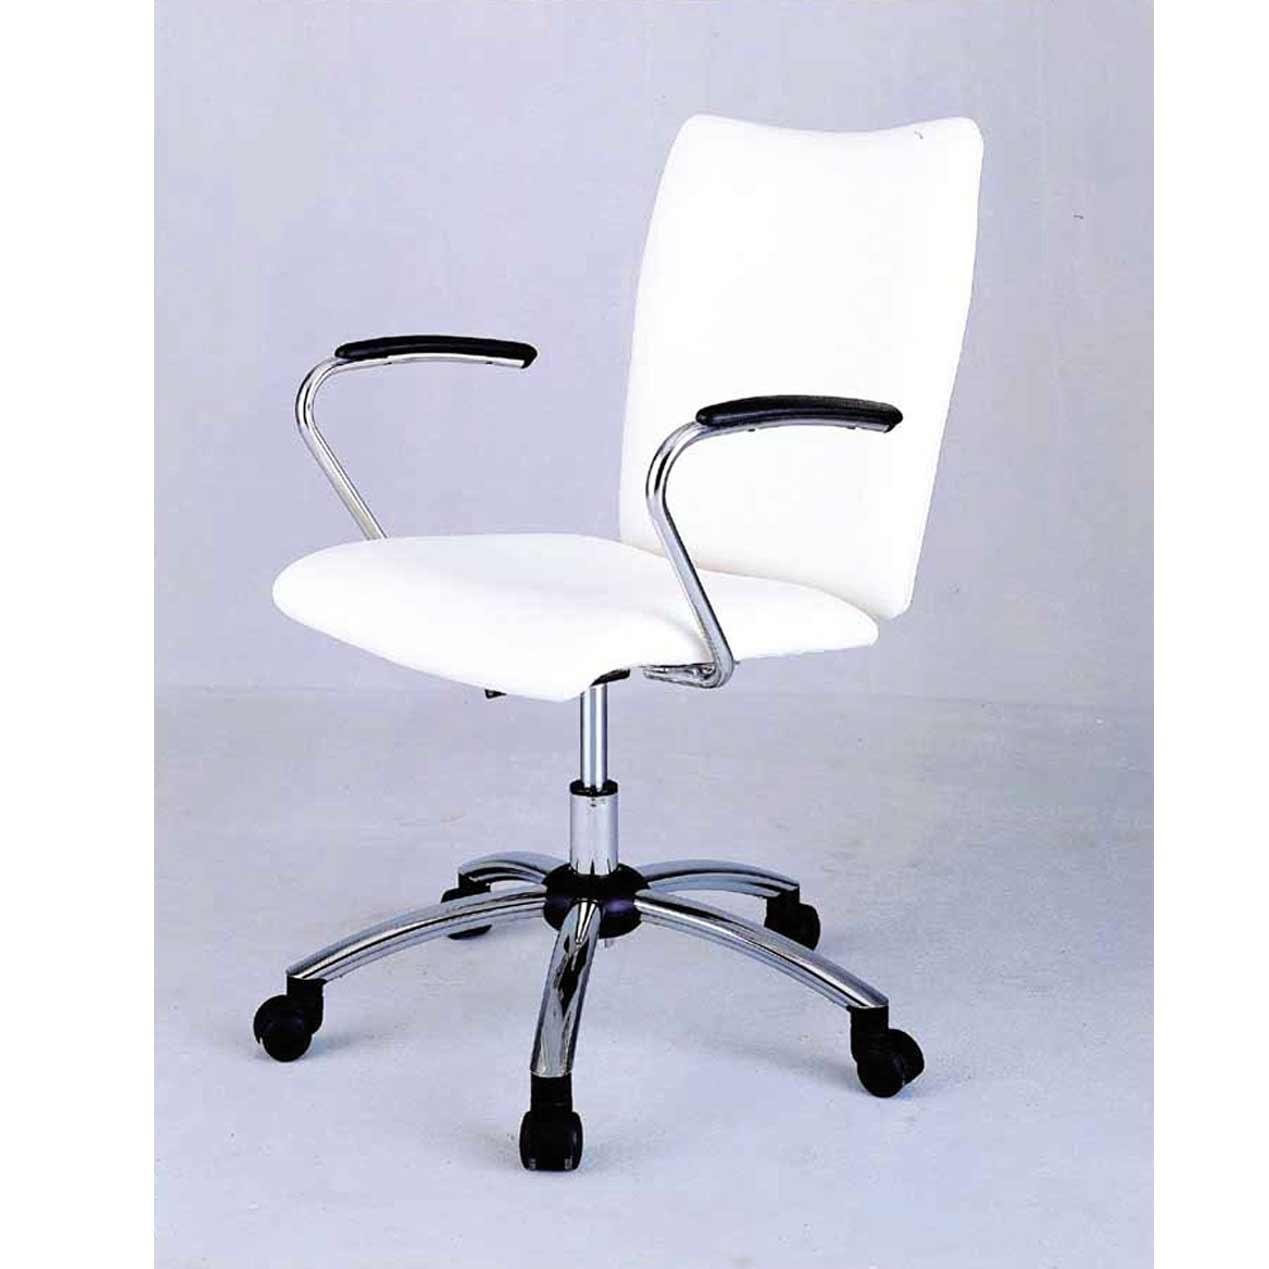 Rolling Desk Chair Benefits